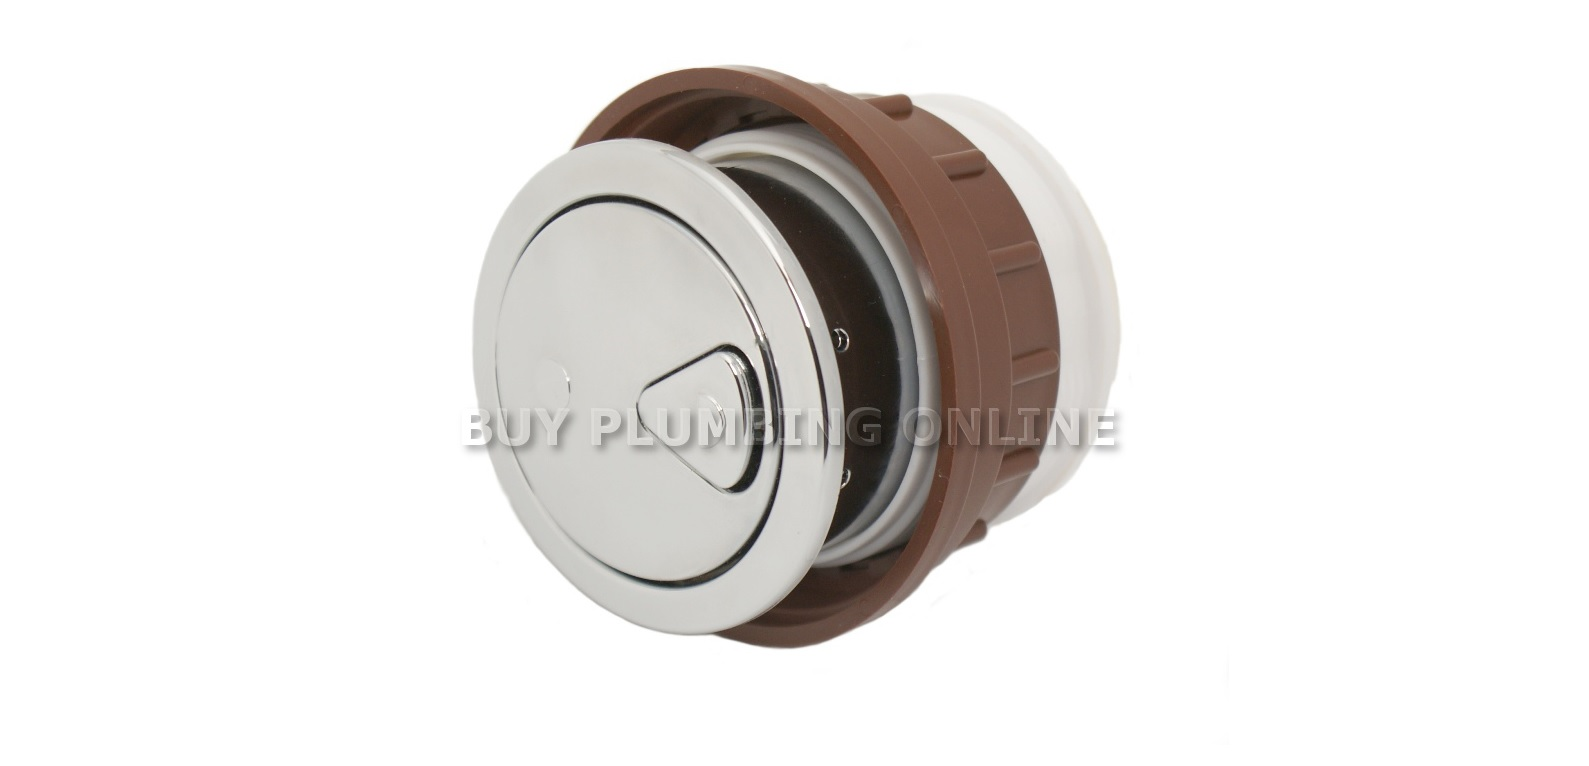 Flush Plates & Buttons